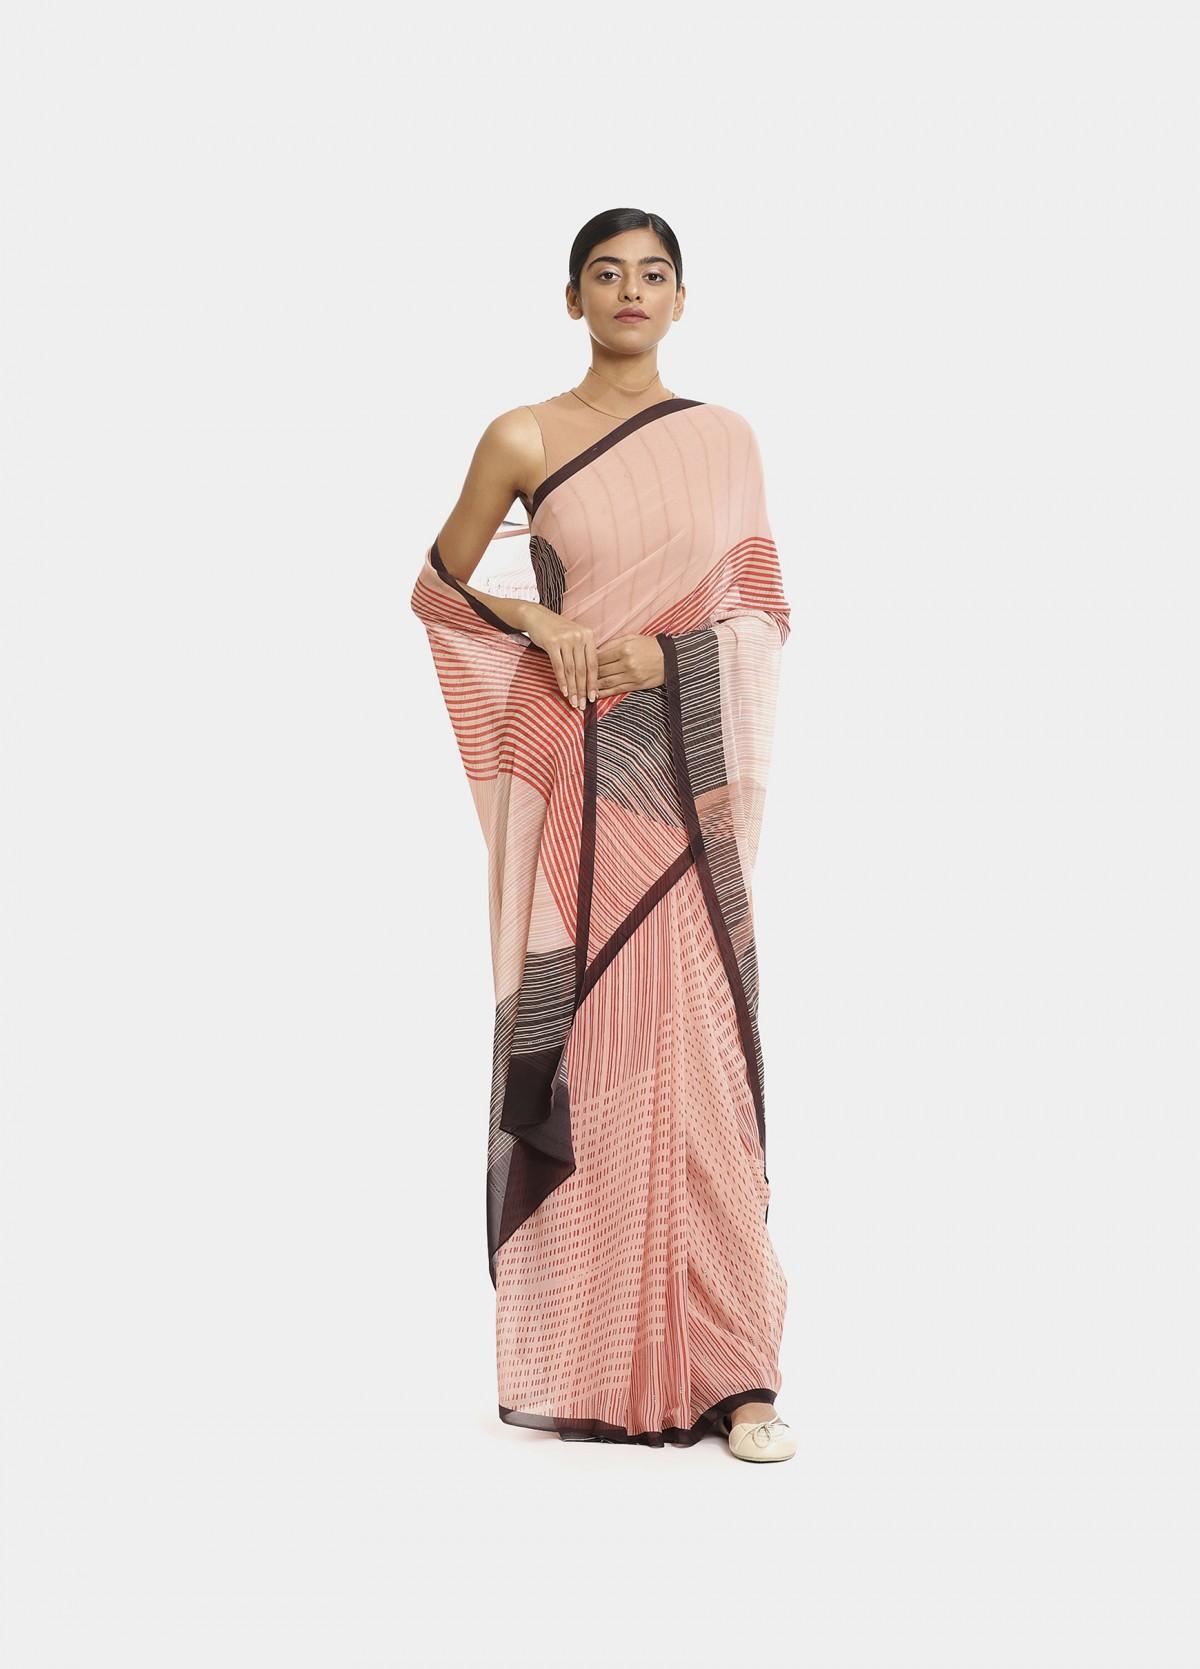 The Dusk Sari